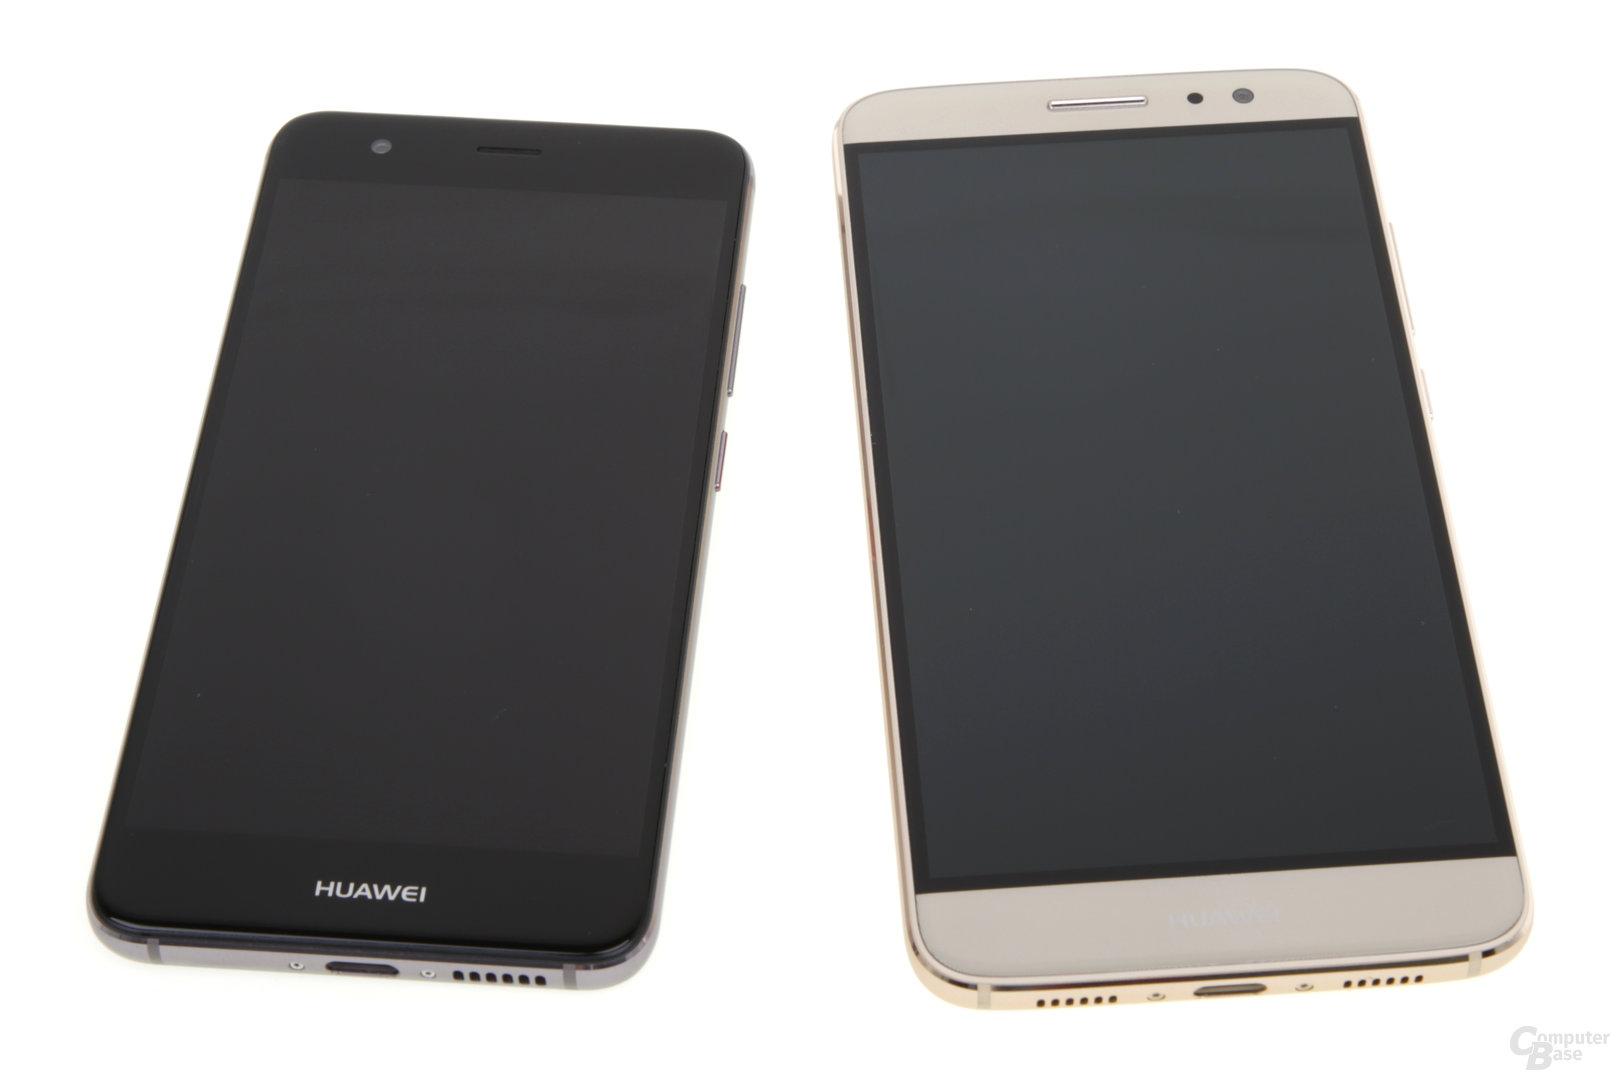 Huawei-Schriftzug kaum erkennbar auf dem Nova Plus